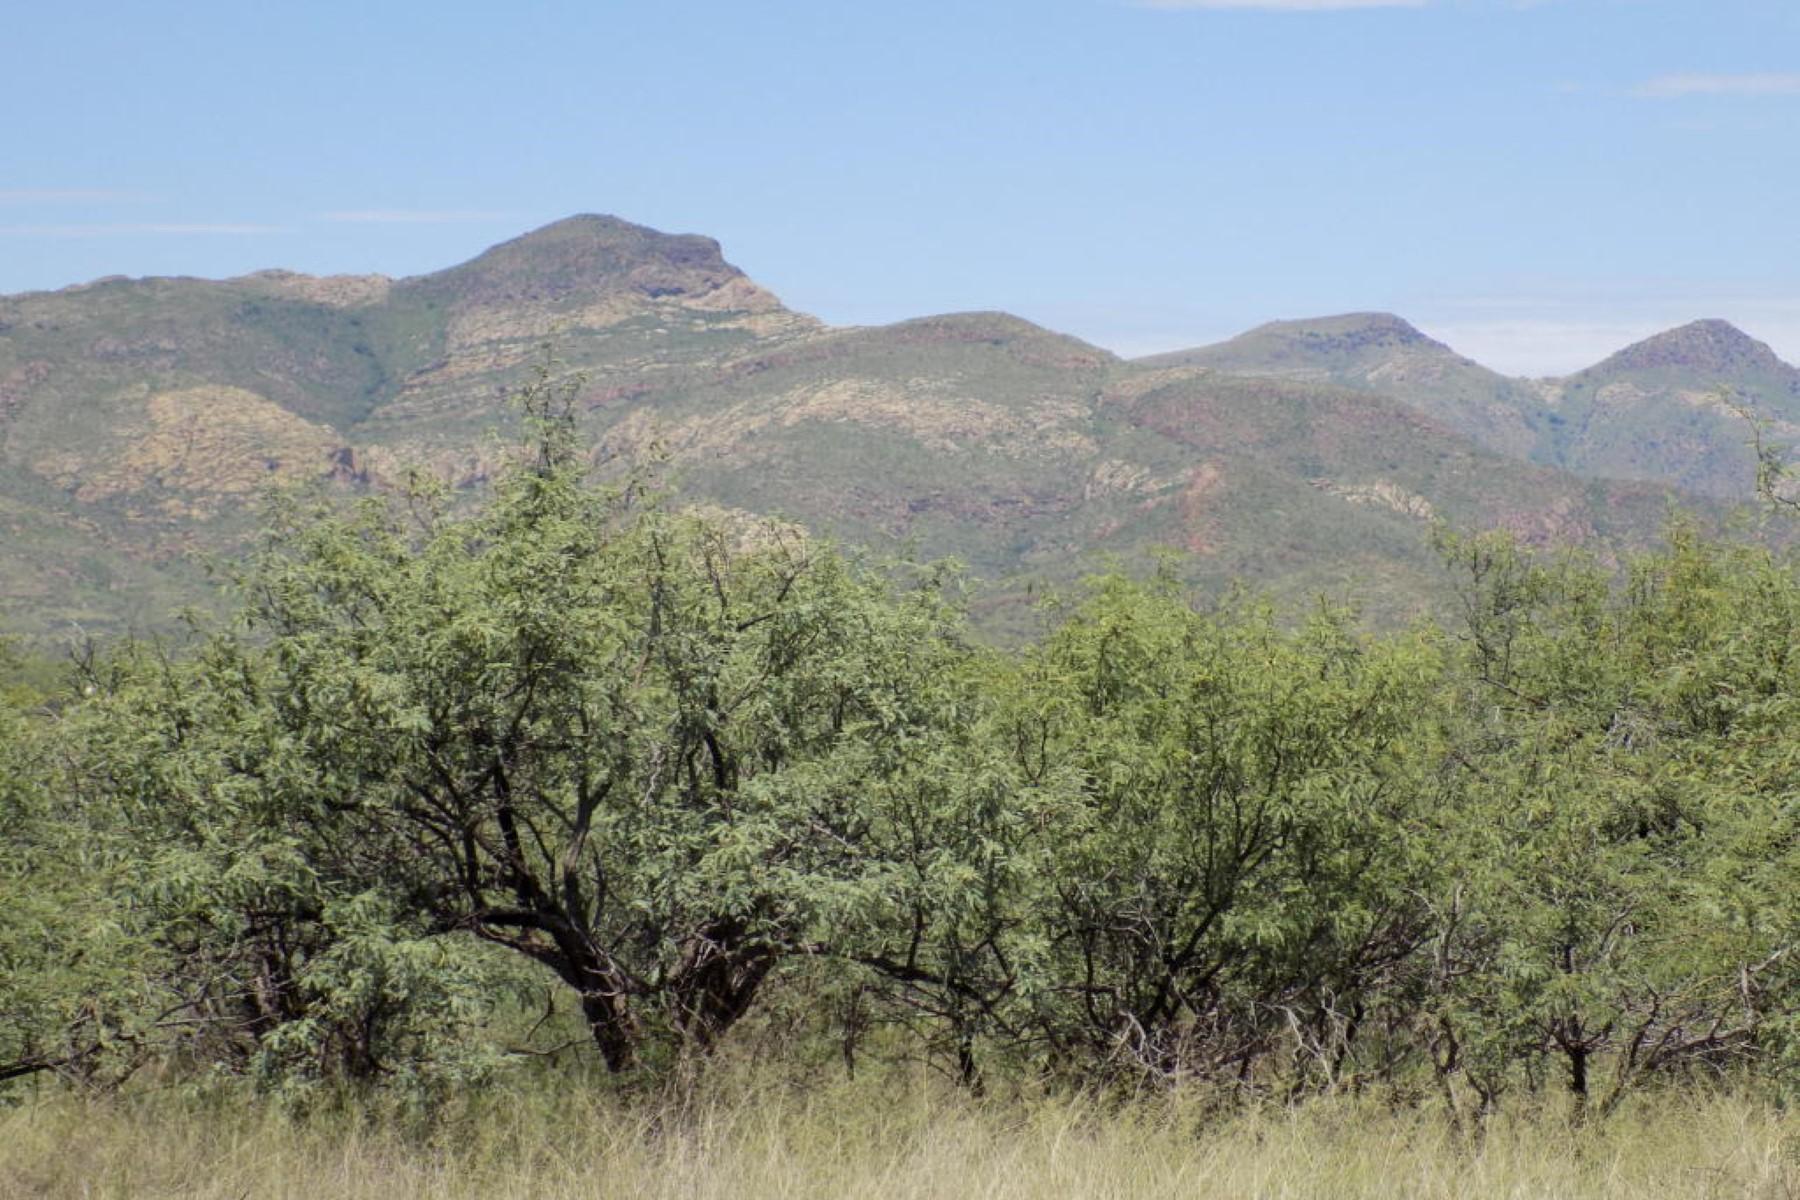 Land for Sale at Wonderful 84.04 acre lot. TBD RIO RICO Rio Rico, Arizona, 85648 United States